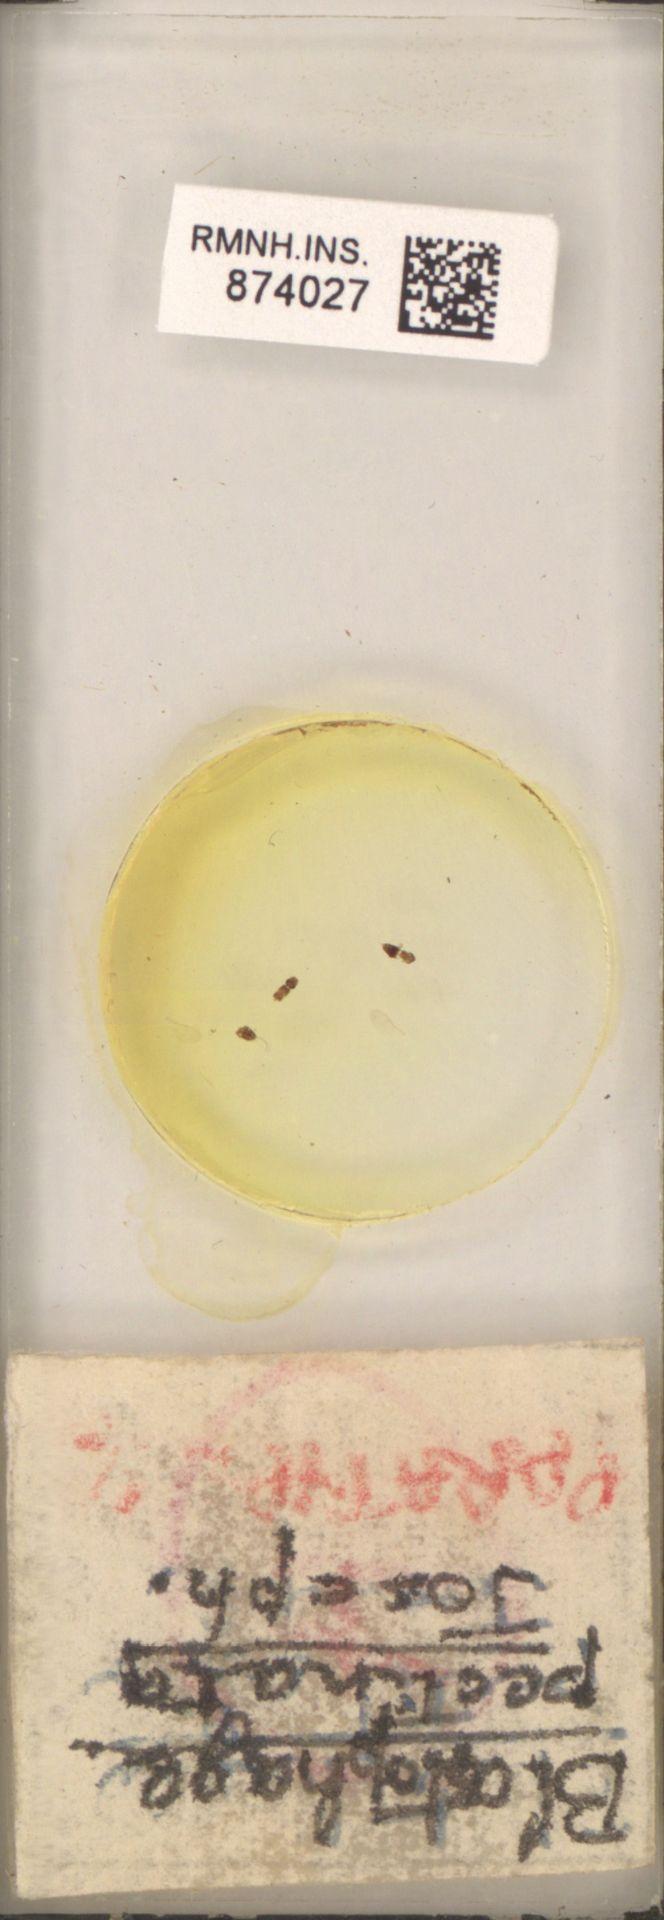 RMNH.INS.874027   Blastophaga pectinata Joseph.